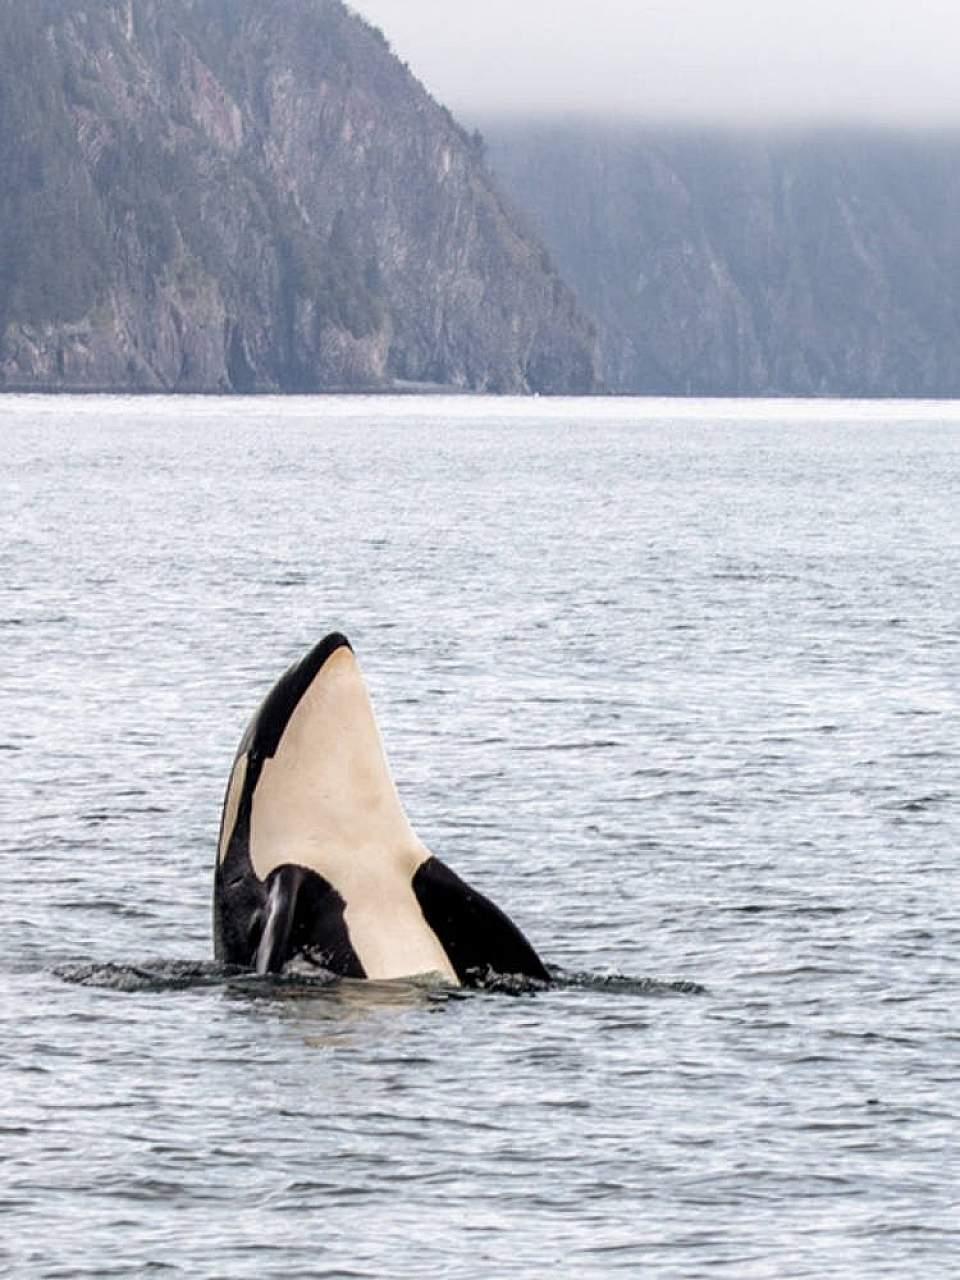 Orca Whale breaching in seward Alaska